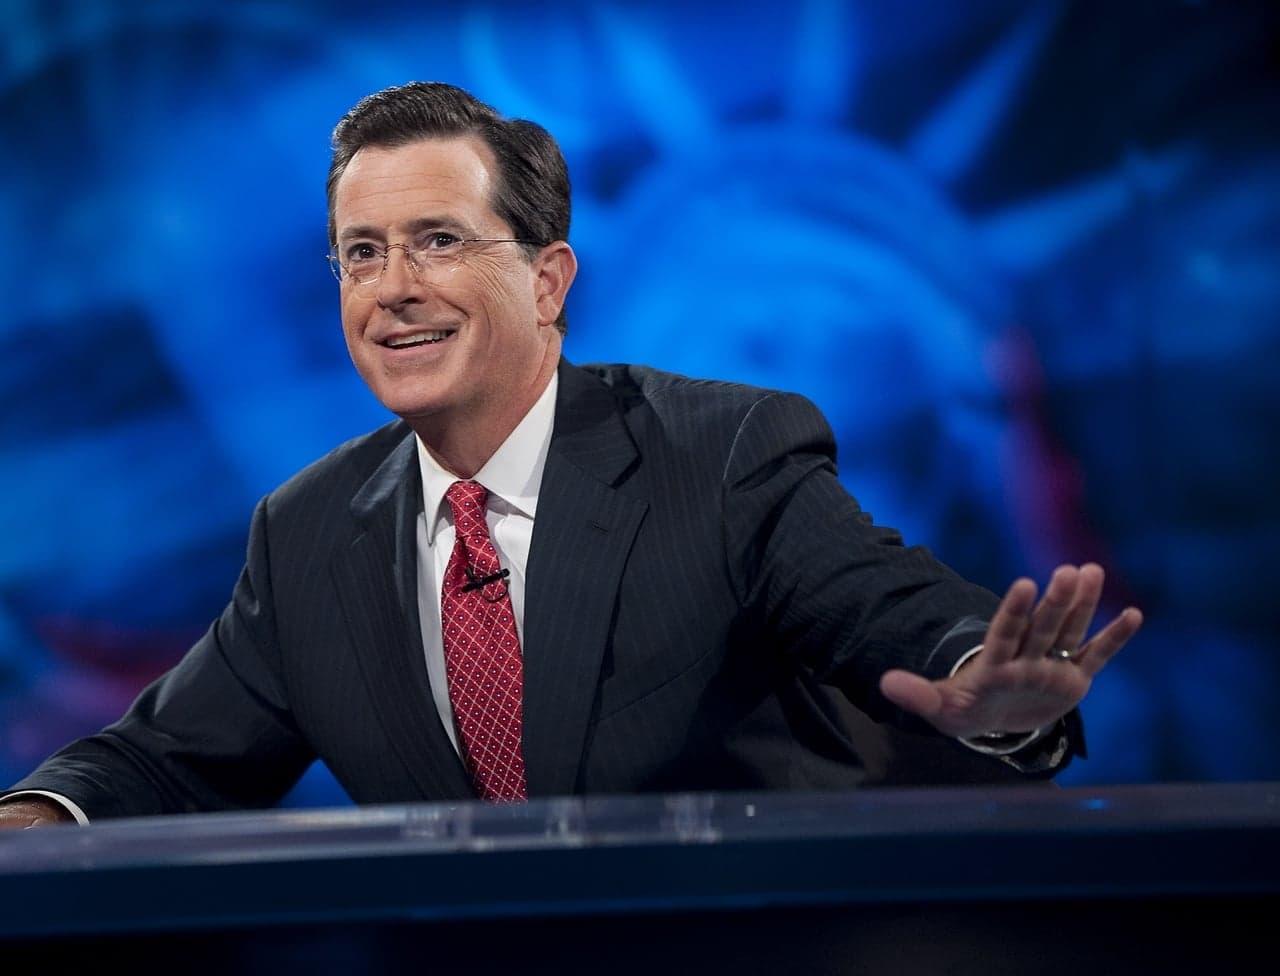 Stephen Colbert 45 Million